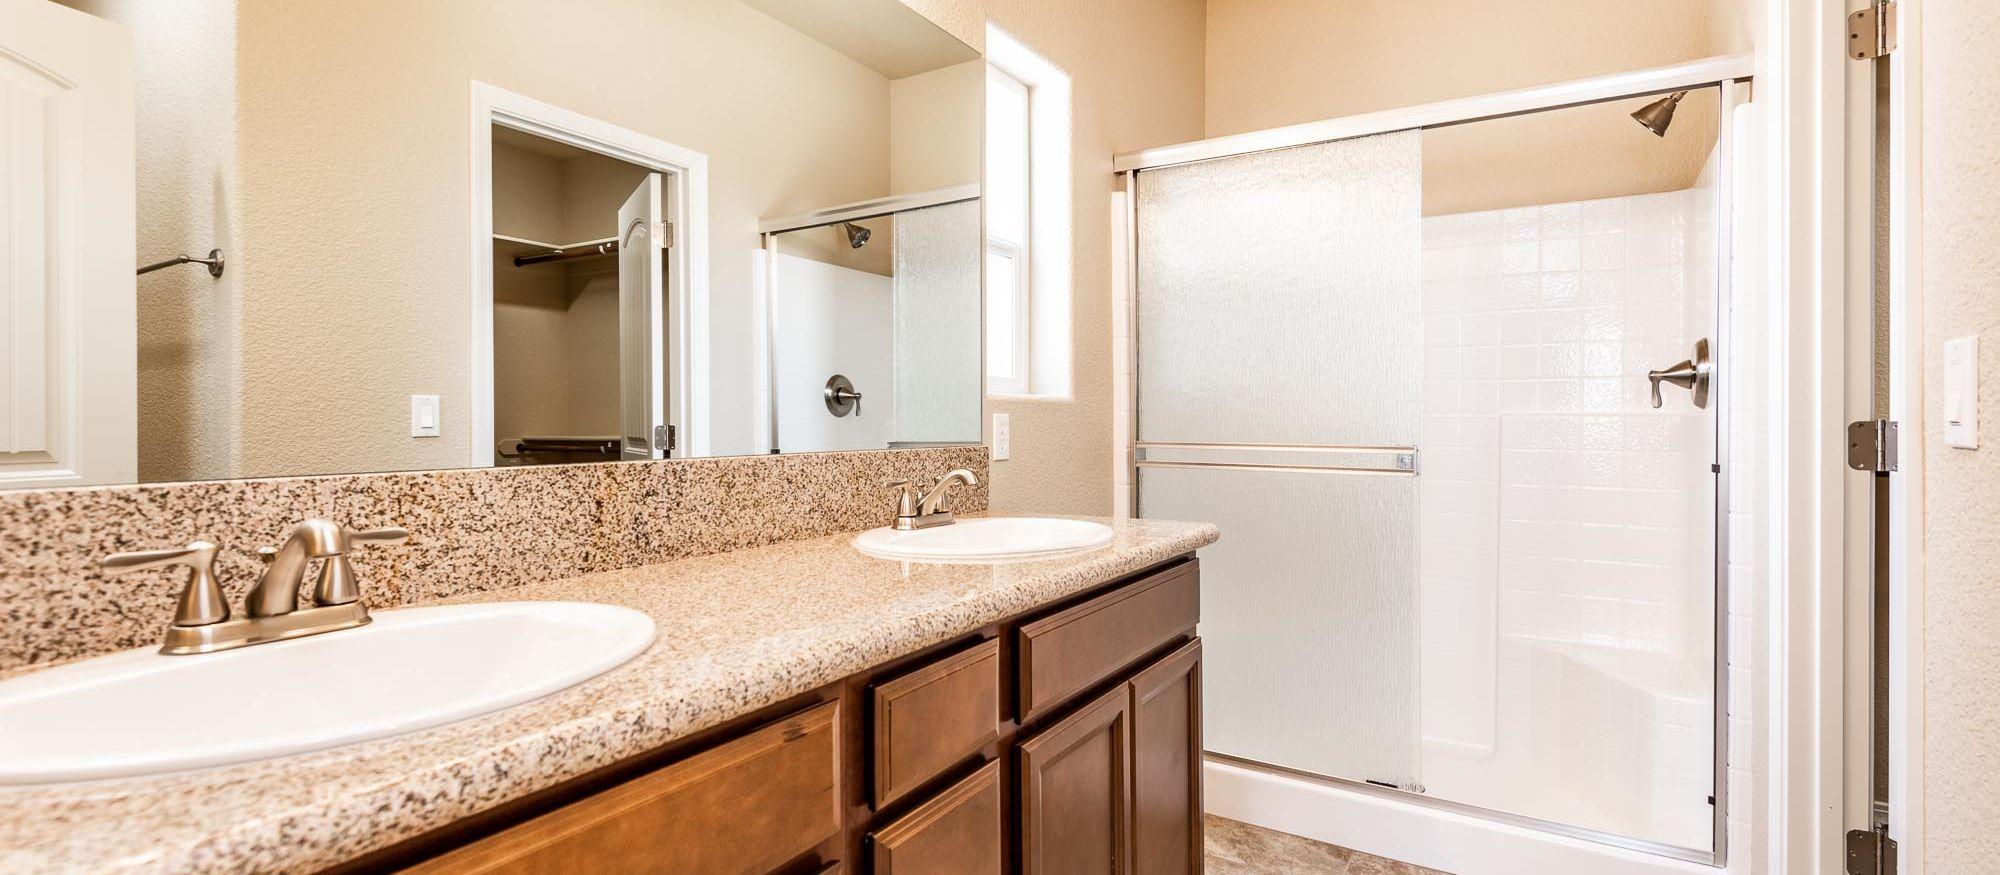 Bathroom featured in the Desert Rose 1472 3 Car By Angle Homes in Kingman-Lake Havasu City, AZ